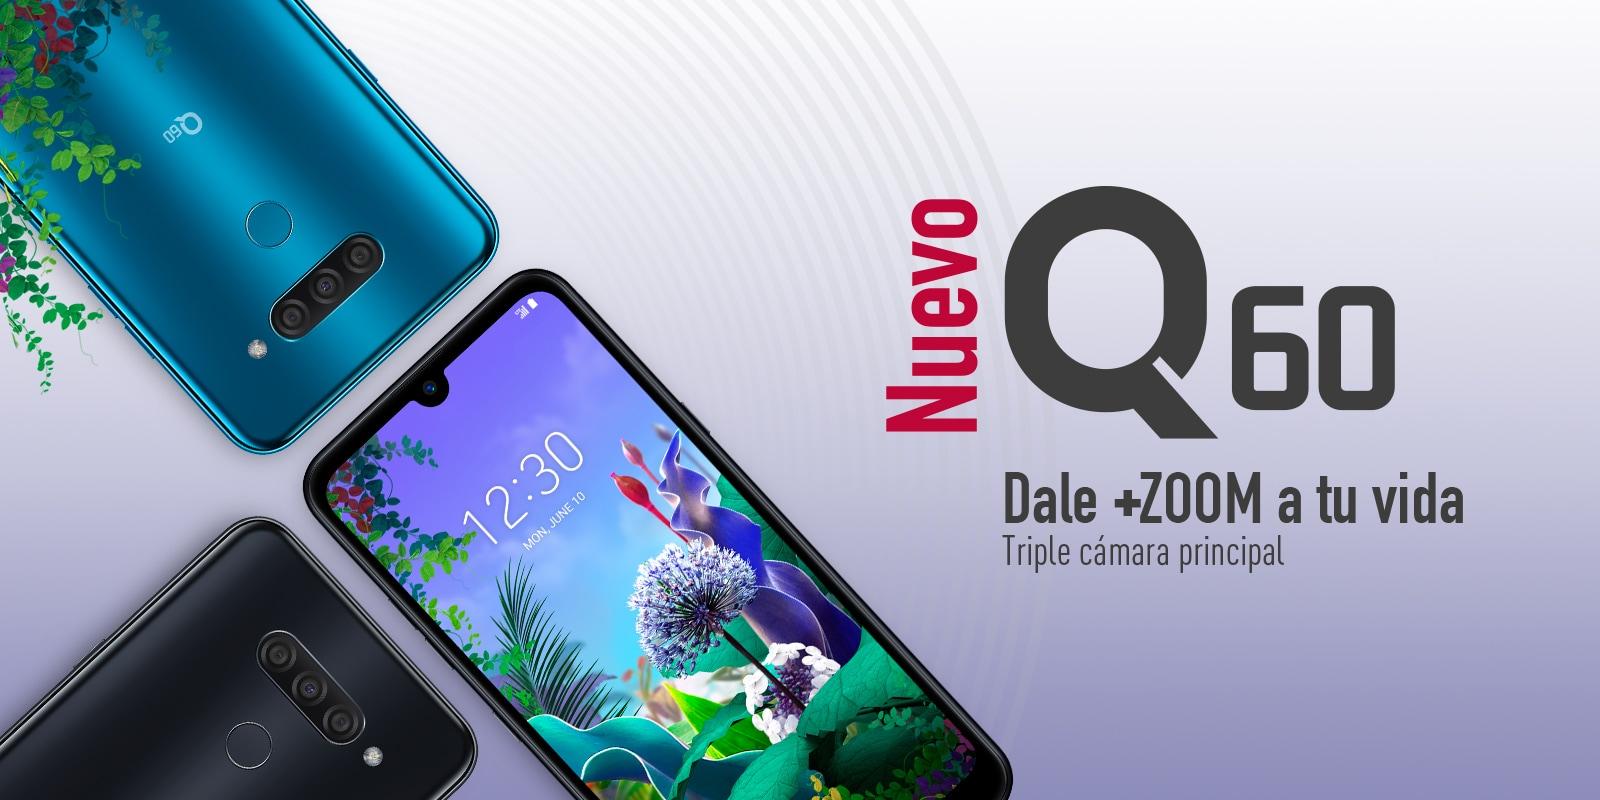 e7f01f80765 Nuevo celular LG Q60 con triple cámara e inteligencia artificial